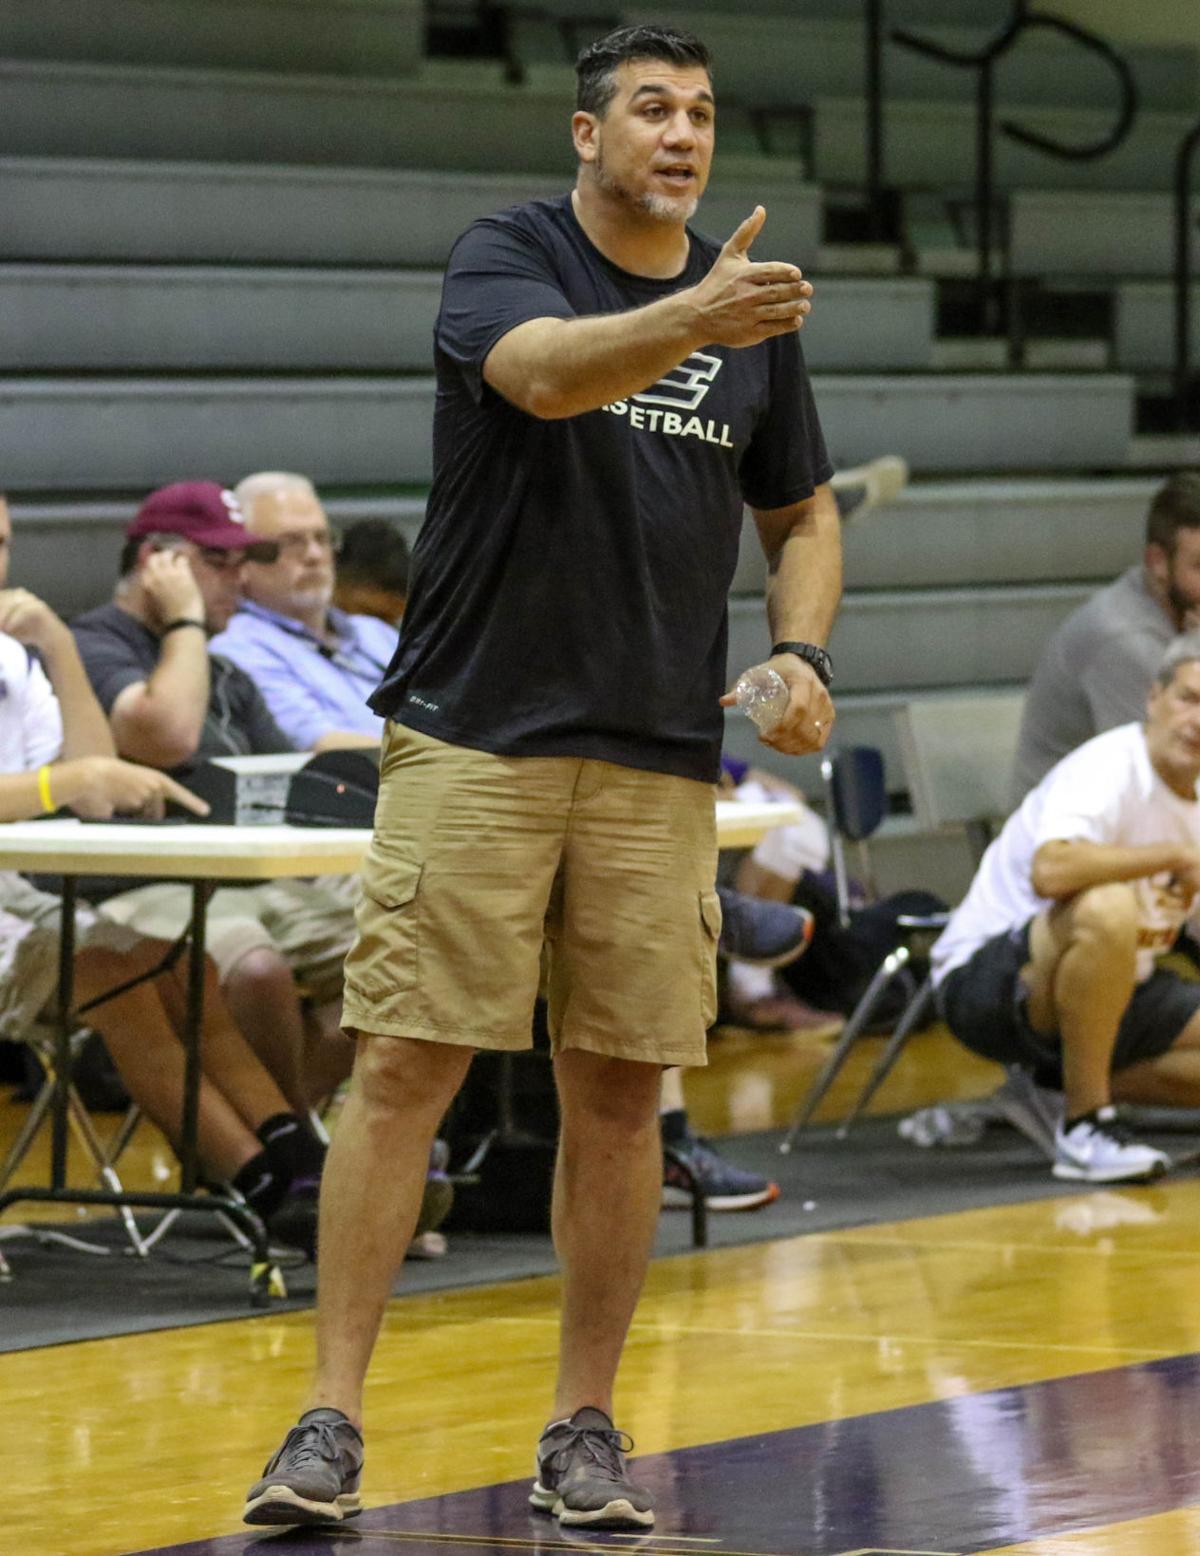 DSHS-Walker basketball Anthony Schiro